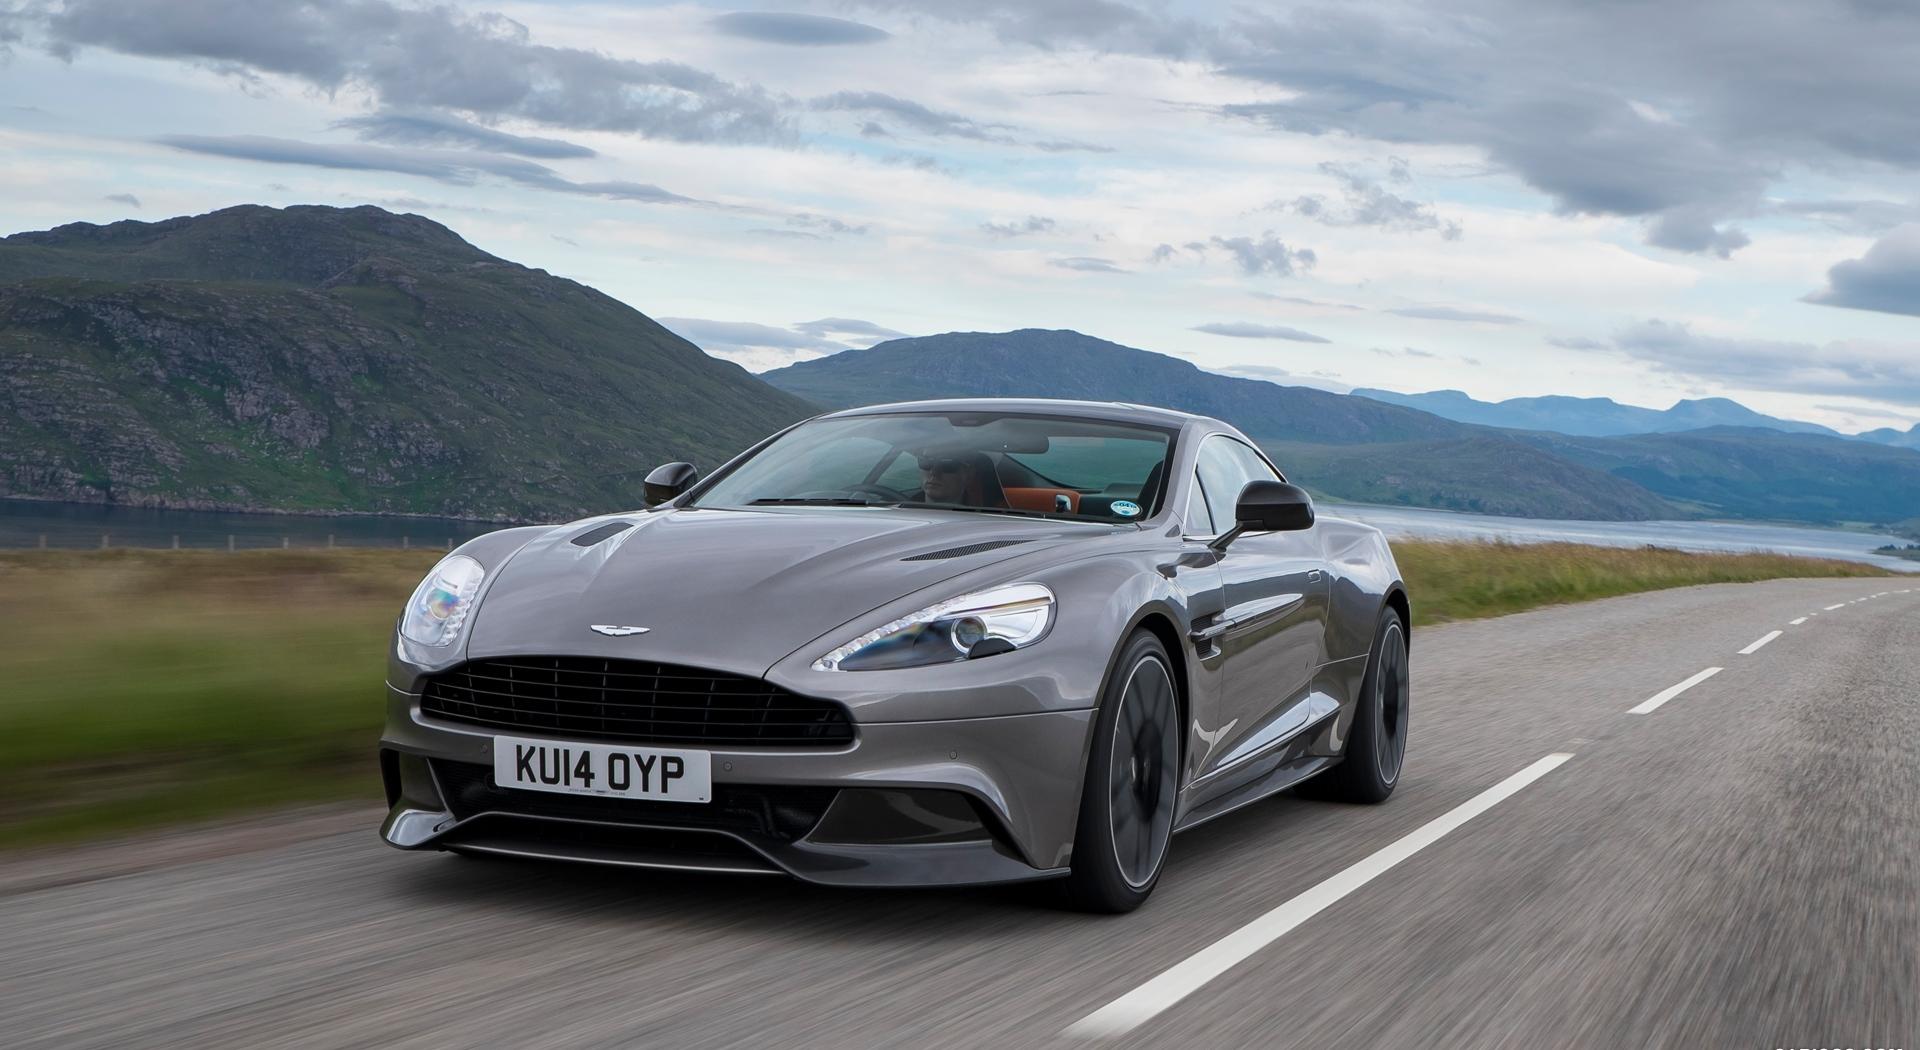 Aston Martin Vanquish Image A1